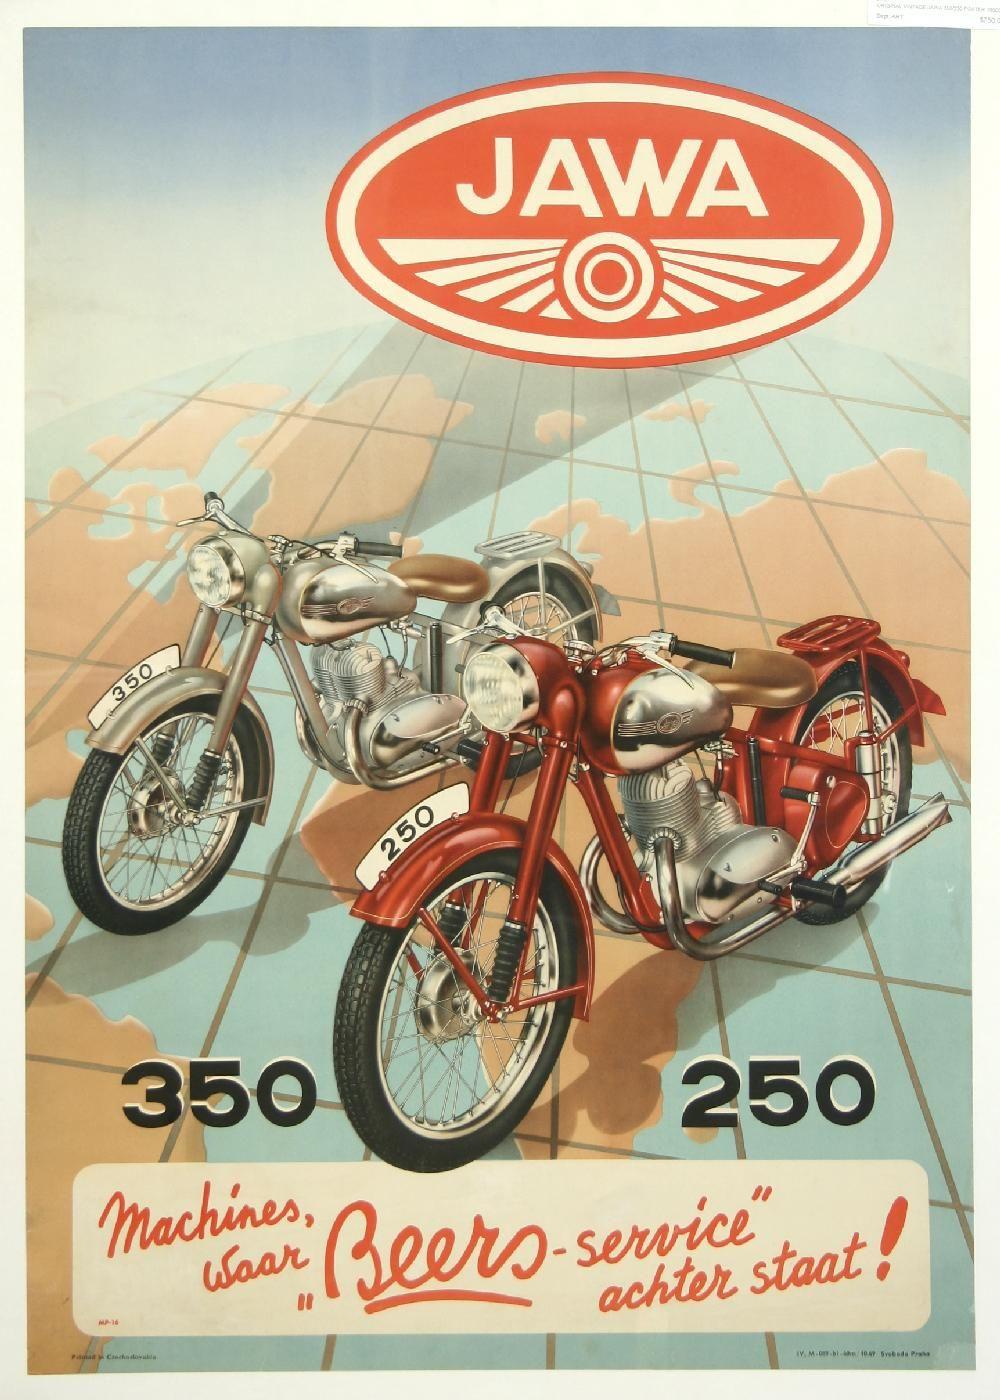 гонки Мотоциклов Ява